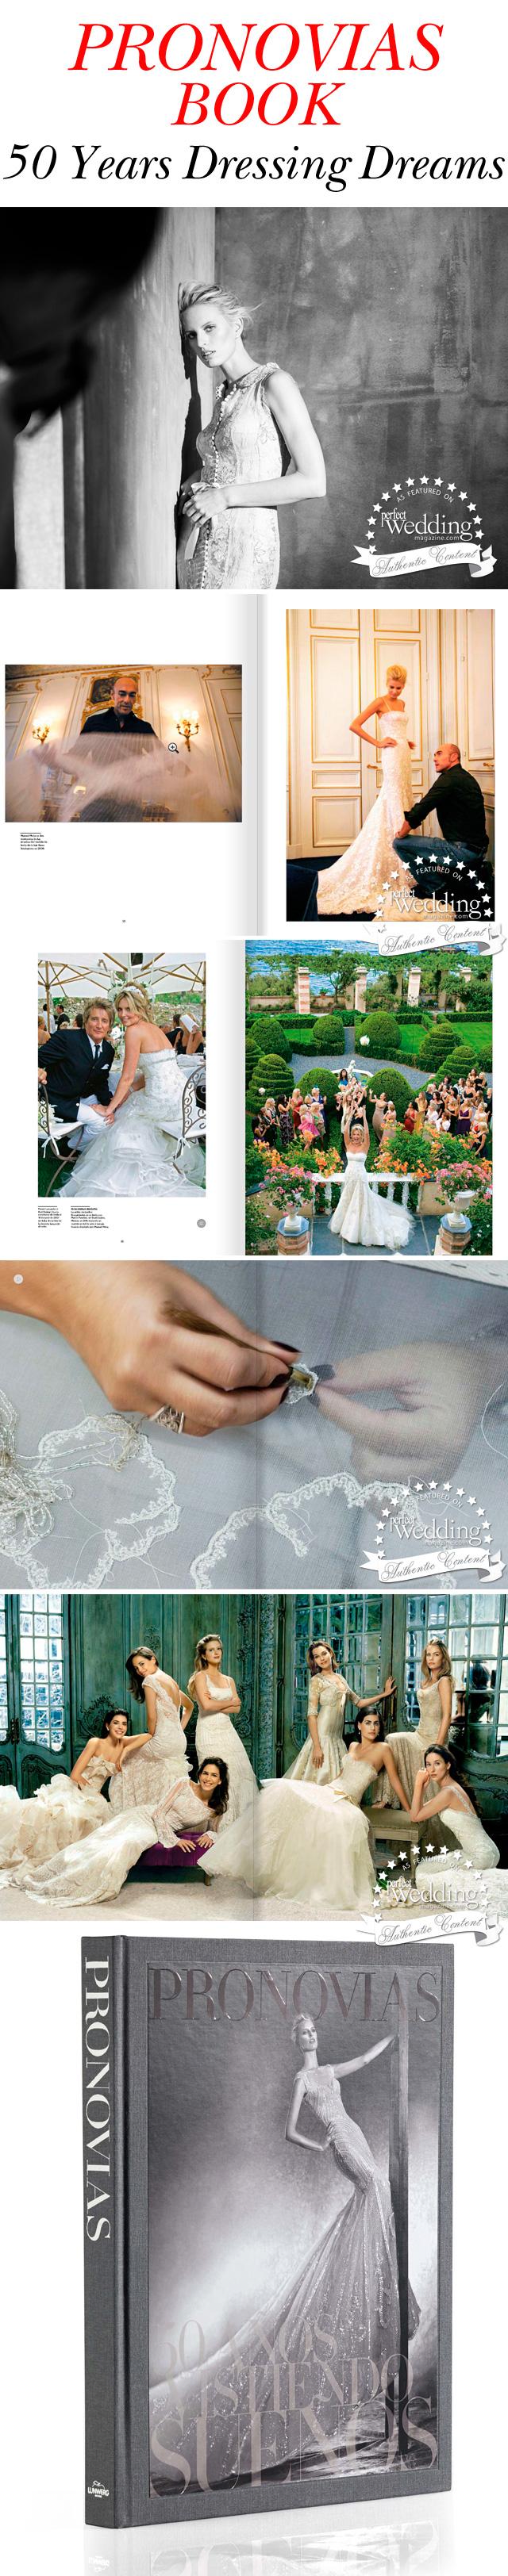 Pronovias, Pronovias Book, Pronovias 50 Years Dressing Dreams, Perfect Wedding Magazine